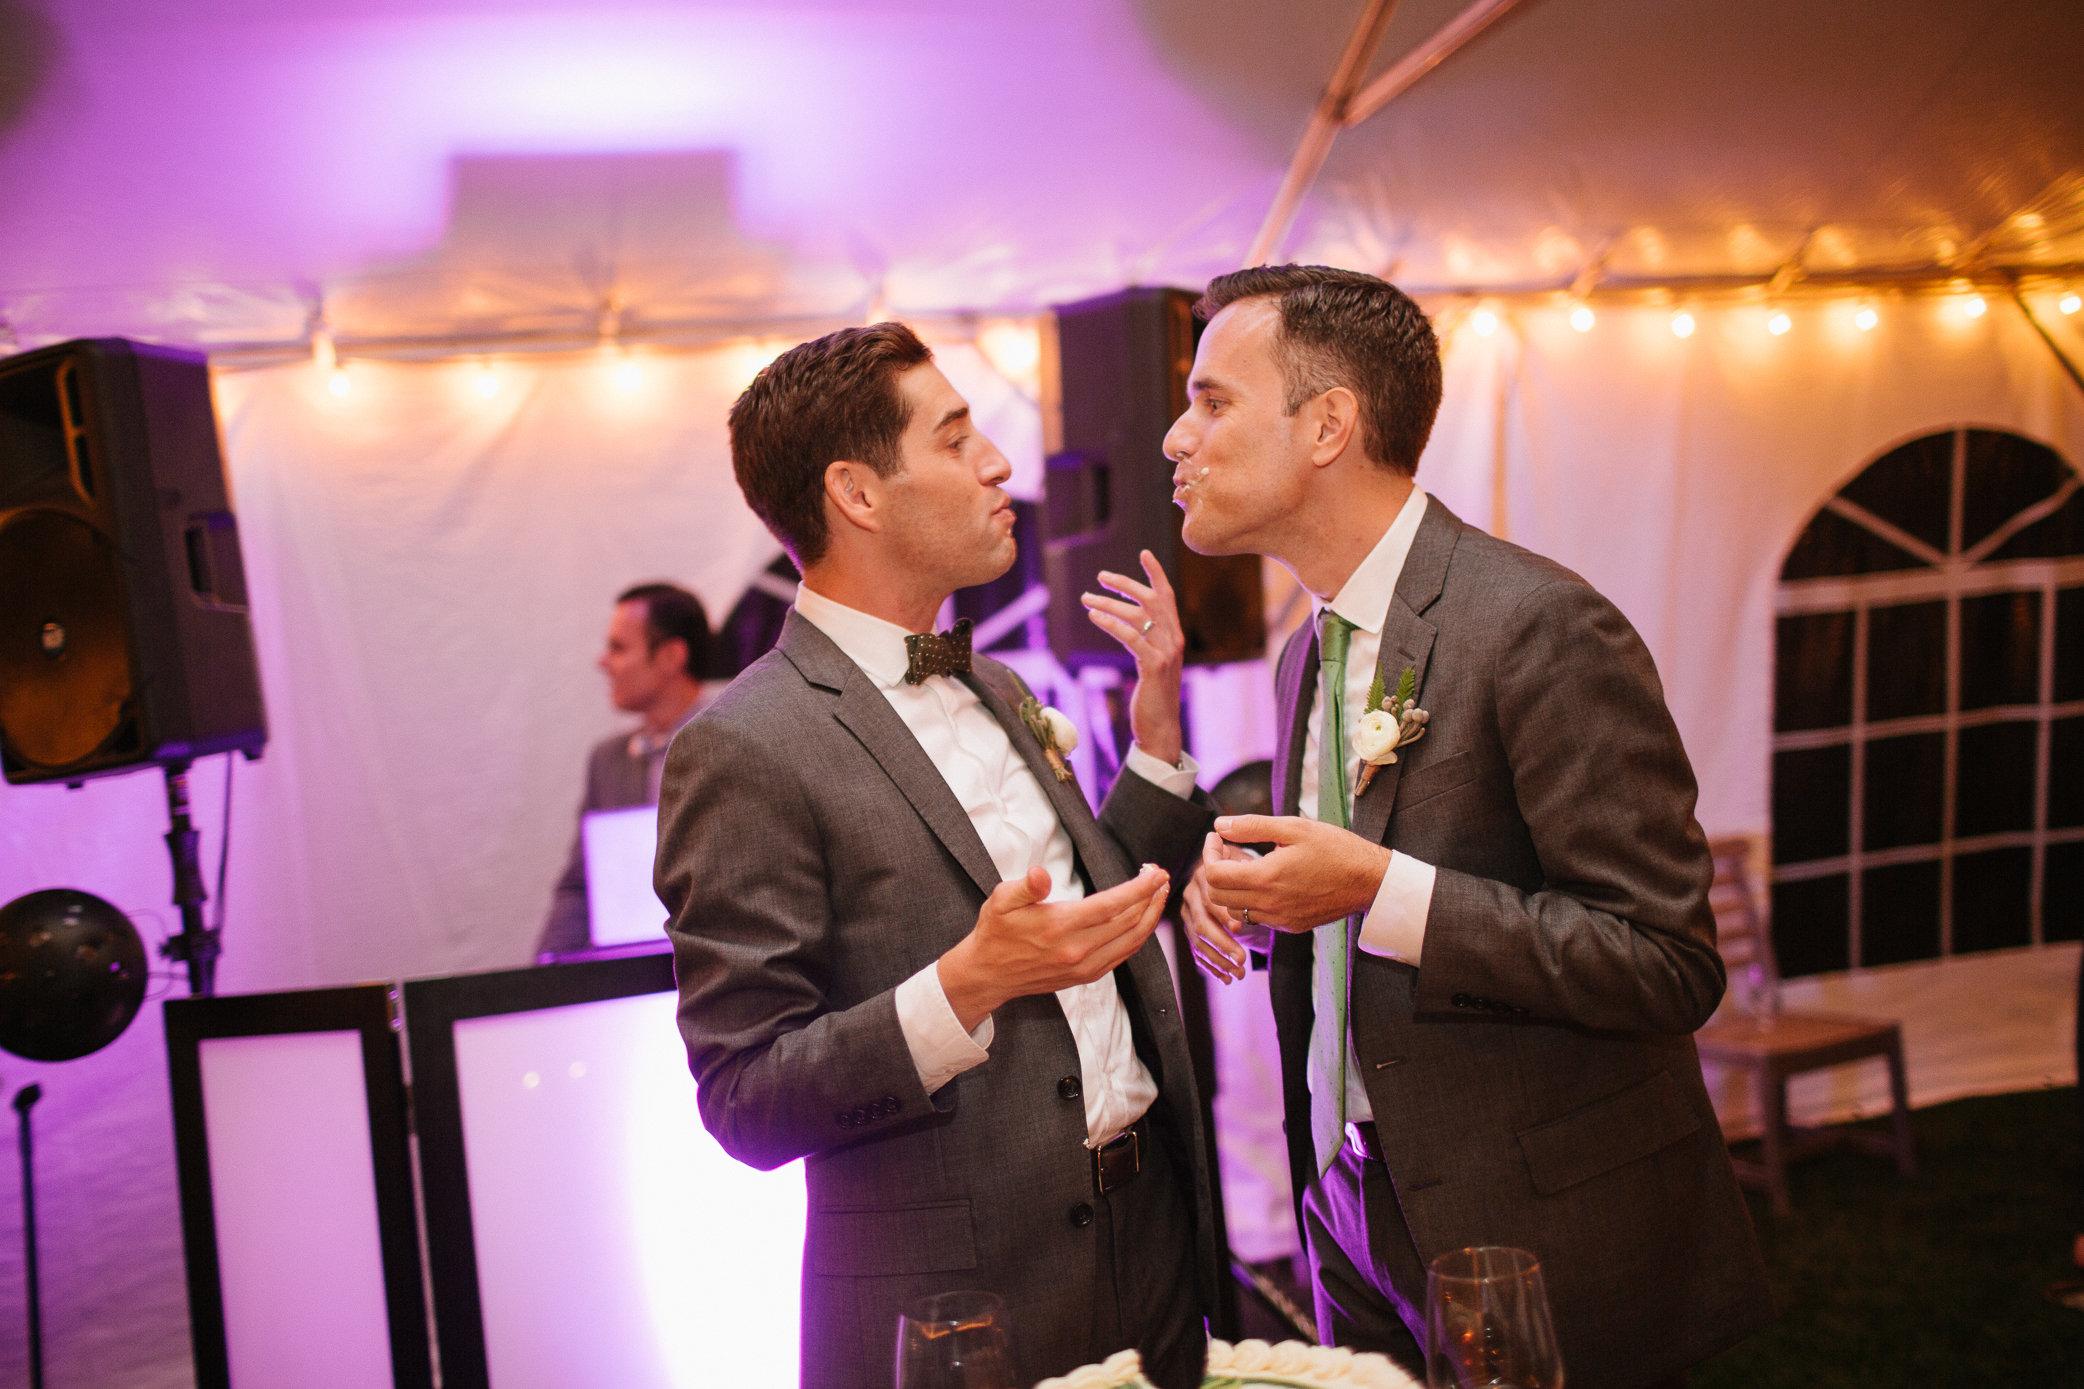 Matt and Seth s Wedding-0 Matt and Seth Sneak Peek-0197.jpg